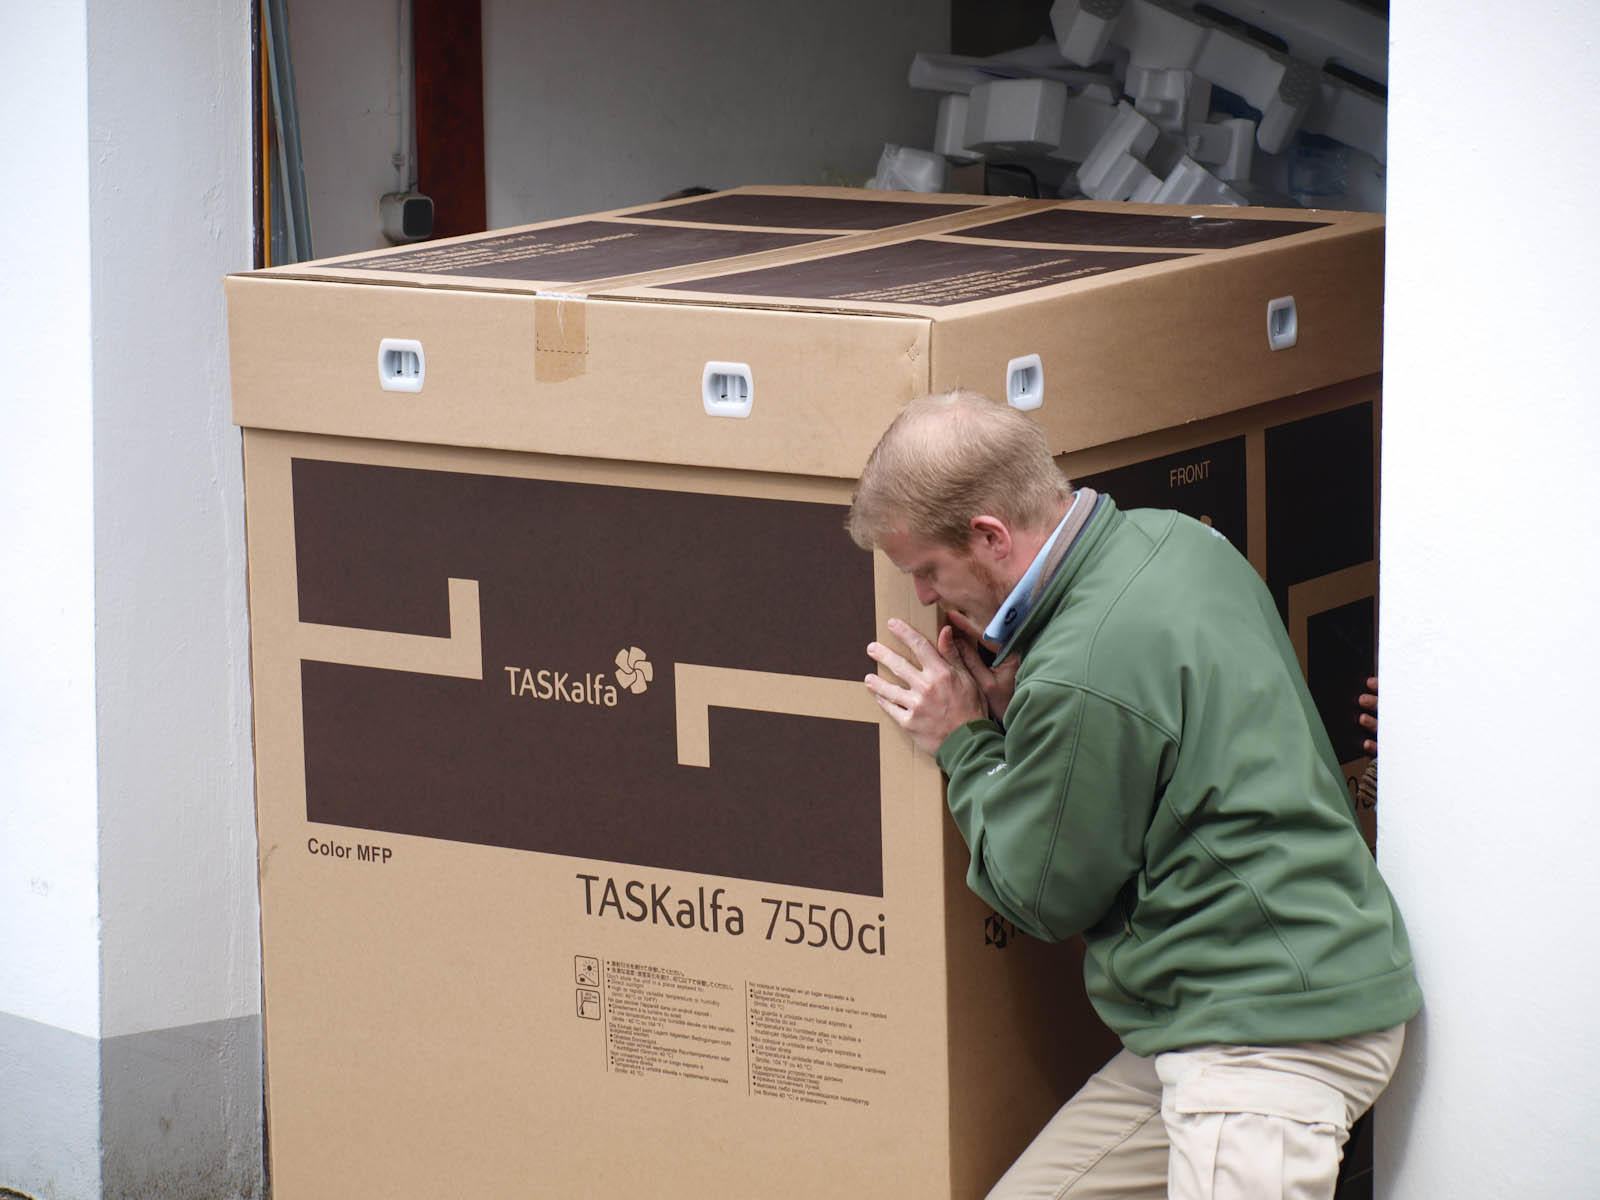 TASKalfa 7550ci: Über 180 Kilo auf der Waage